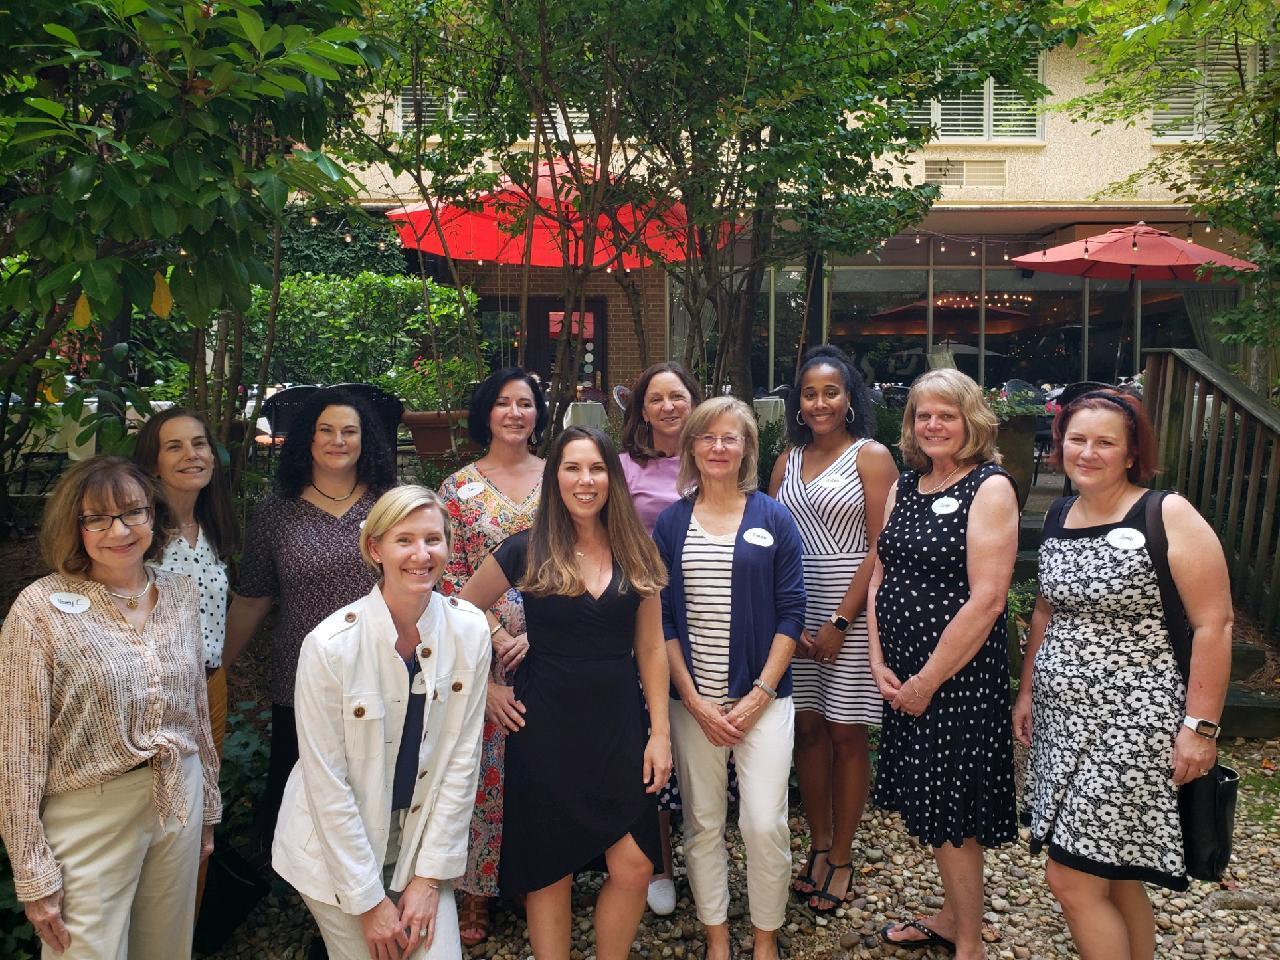 Our registered dietitians (left to right): Joy Holway, Johane Filemon,<br> Julie Newton, Briana Johnson, Rebecca Casey, Suzan <br>Jackovatz, Jamie Borghardt, and Nancy Lake.